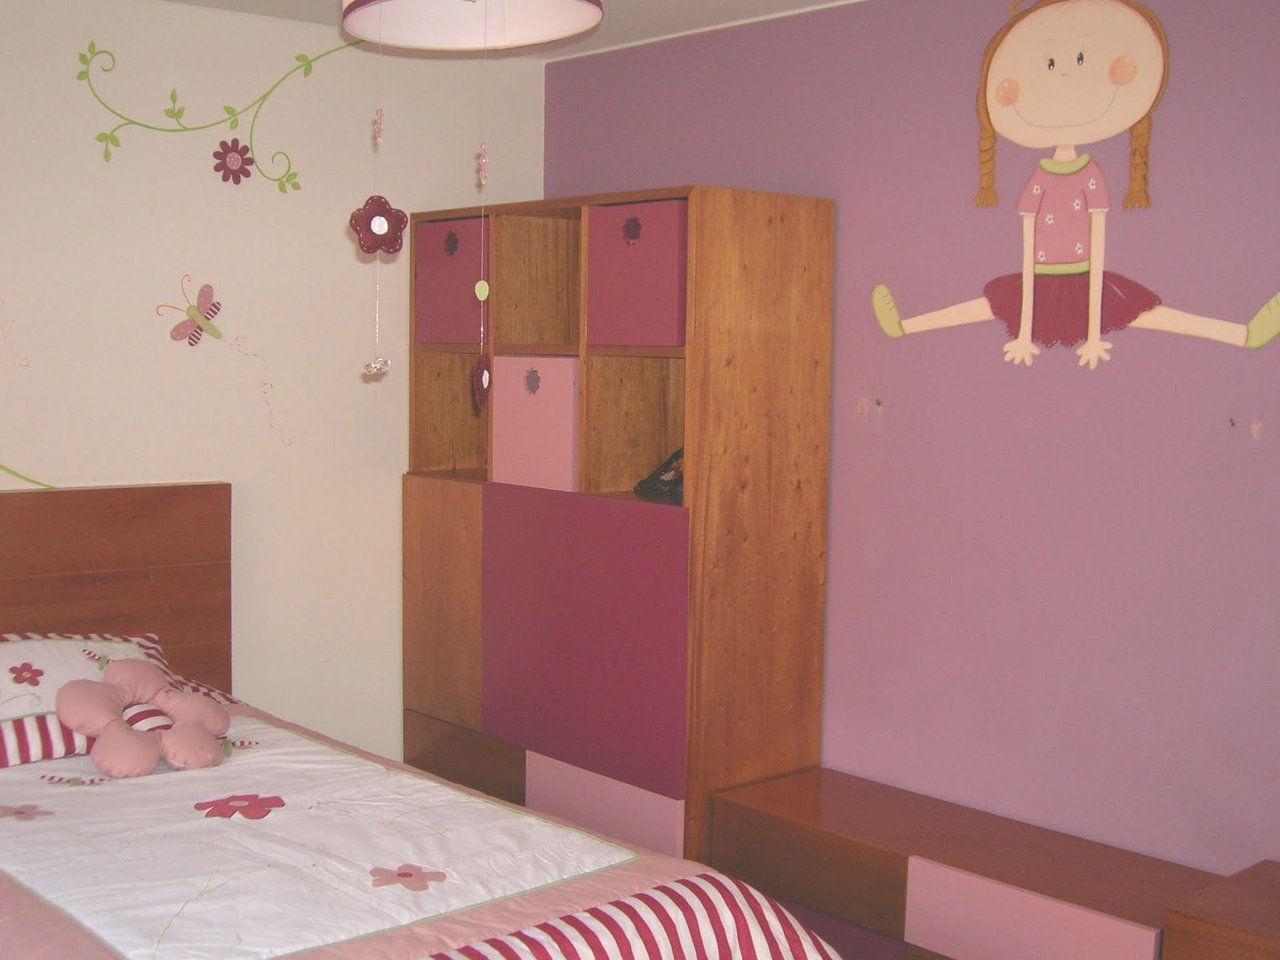 Demi s decor tapiceria y decoracion galeria for Tapiceria y decoracion